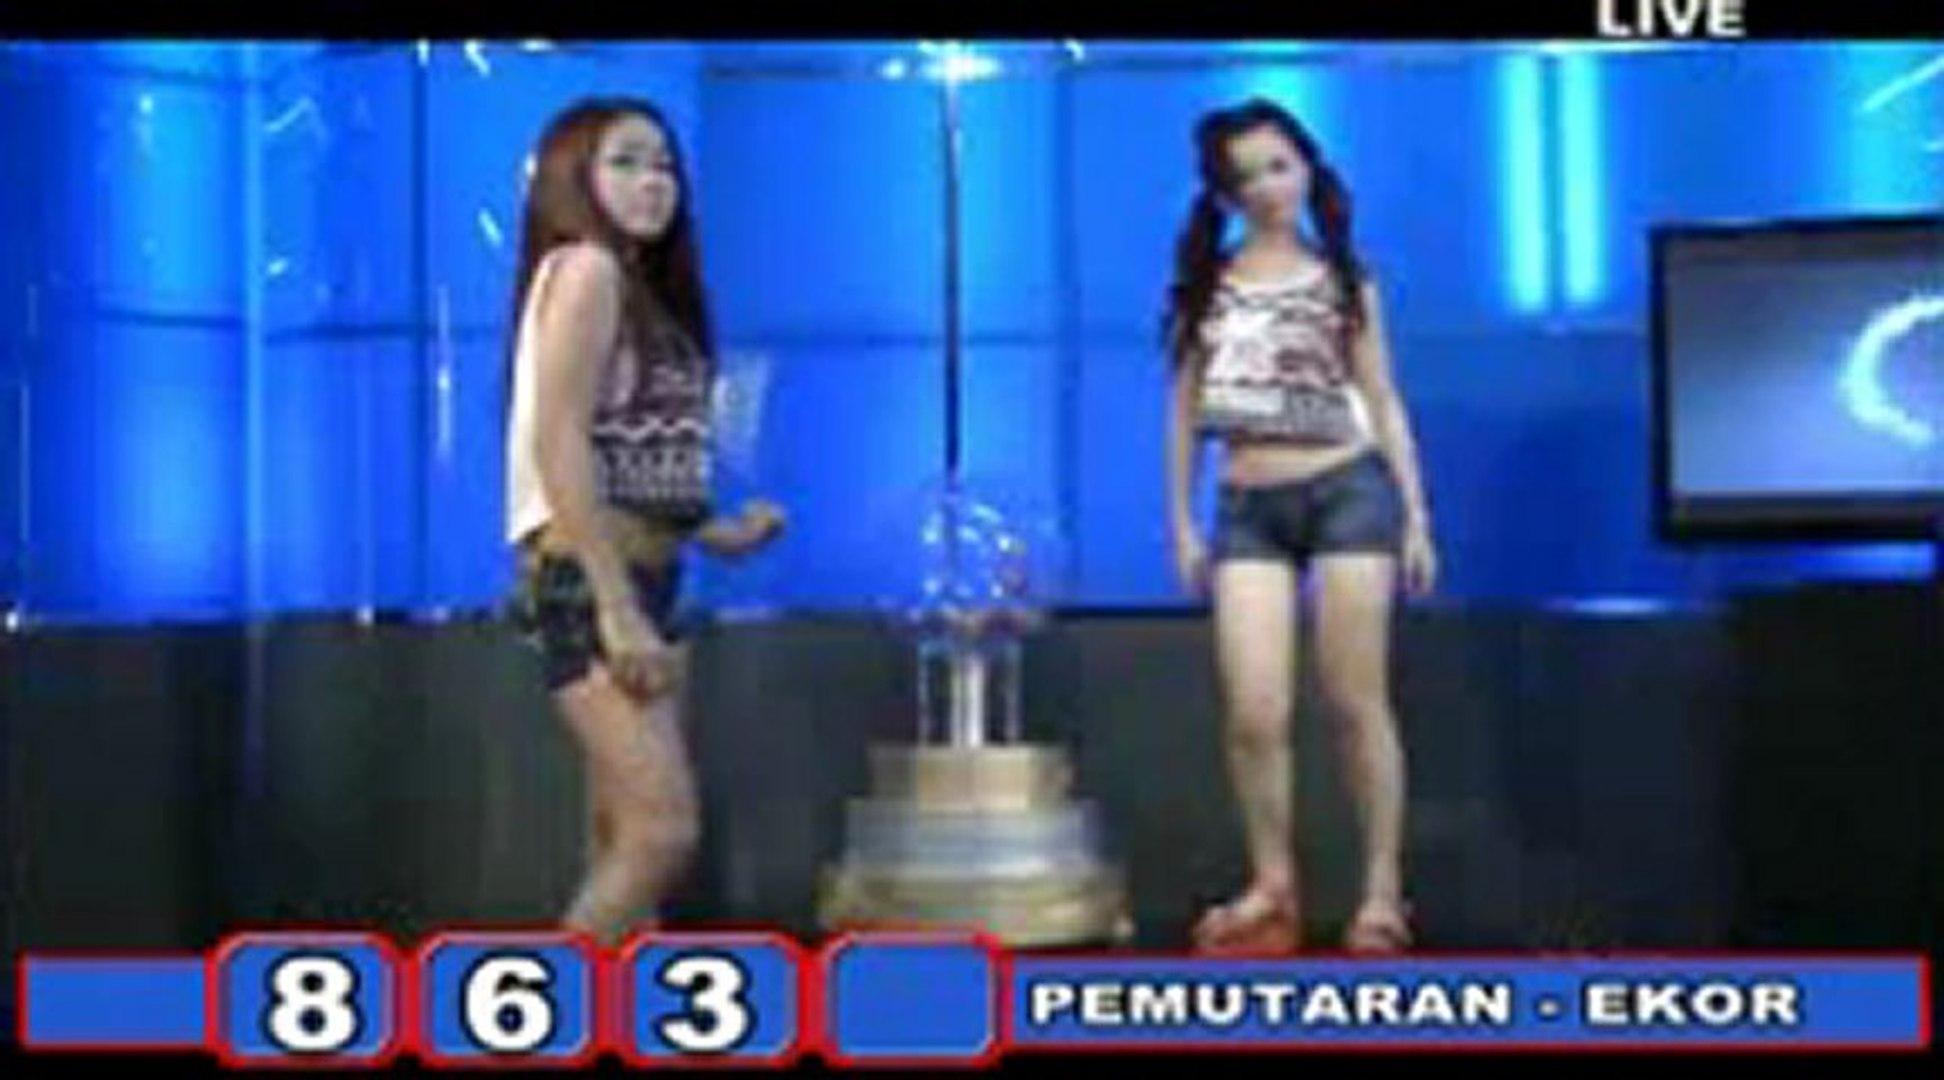 Undian Nomor Buntut DEWA TOGEL JAKARTA POOLS tgl 28 December 2012